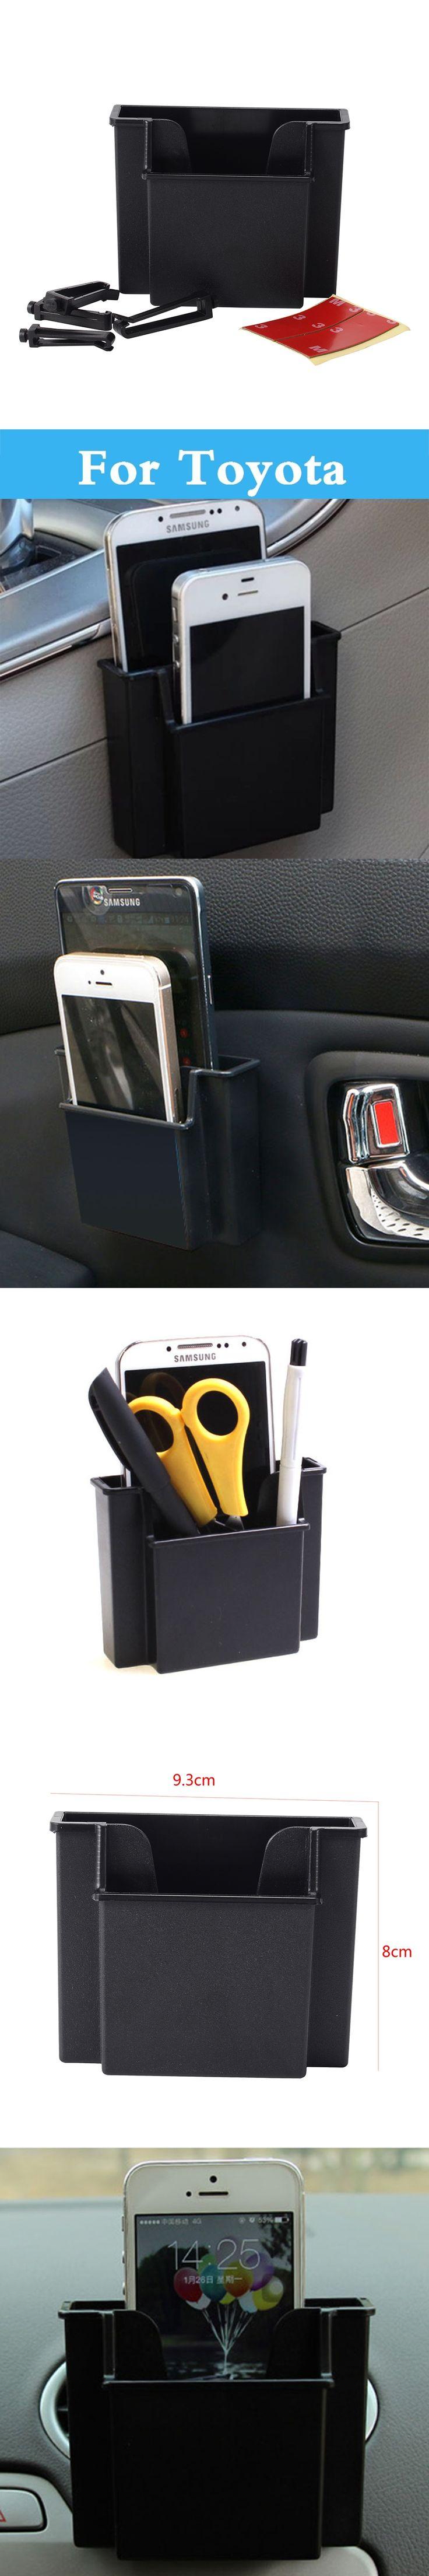 Car Storage Pouch Bag Store Phone Charge Box Holder Organizer Box For Toyota Rav 4 Rush Sai Prius Prius C Probox Progres Pronard